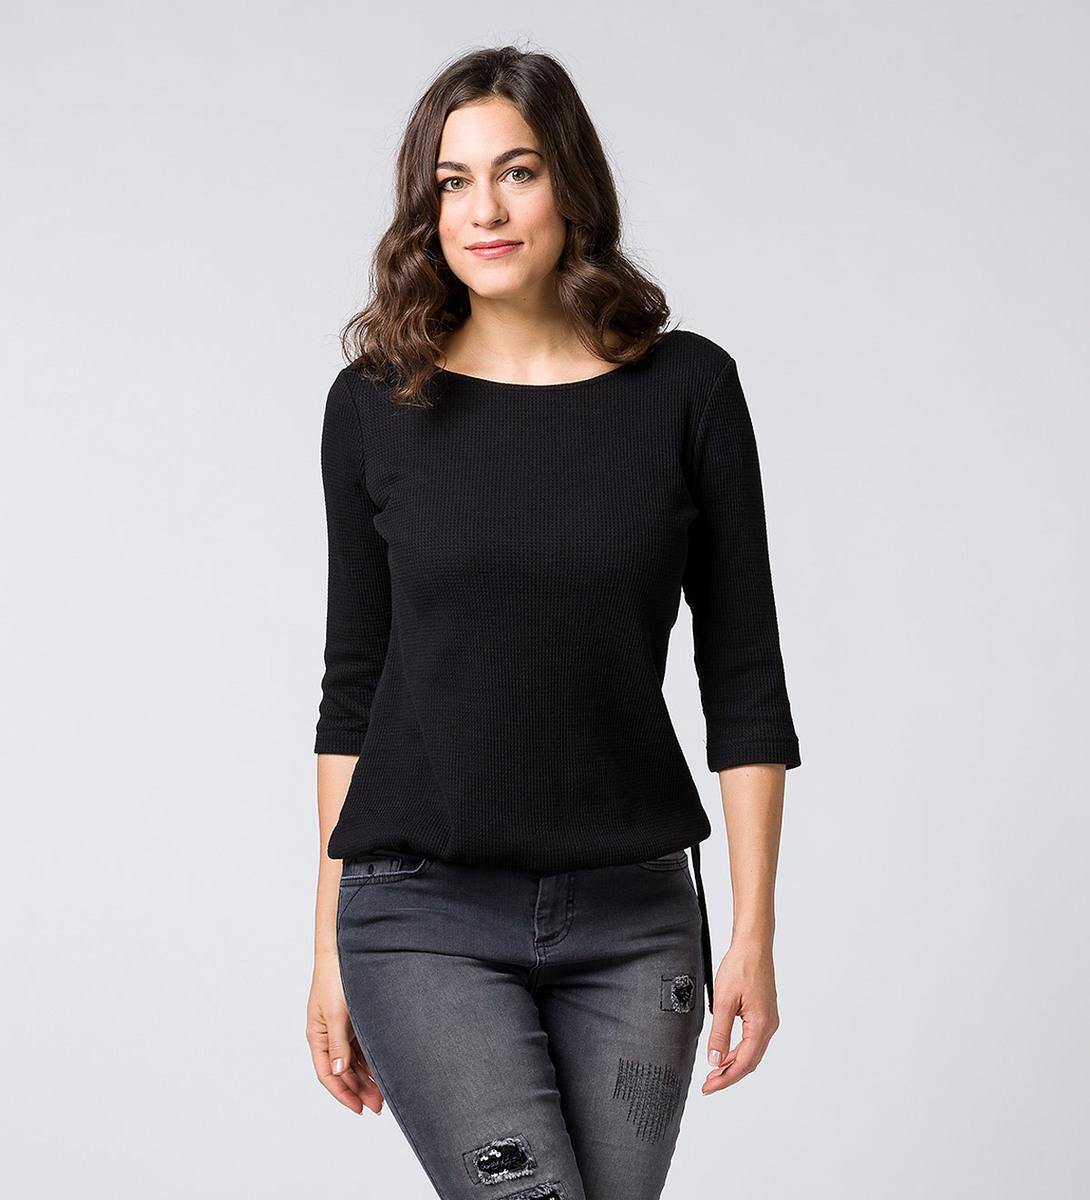 Jerseysweater in Strukturoptik black